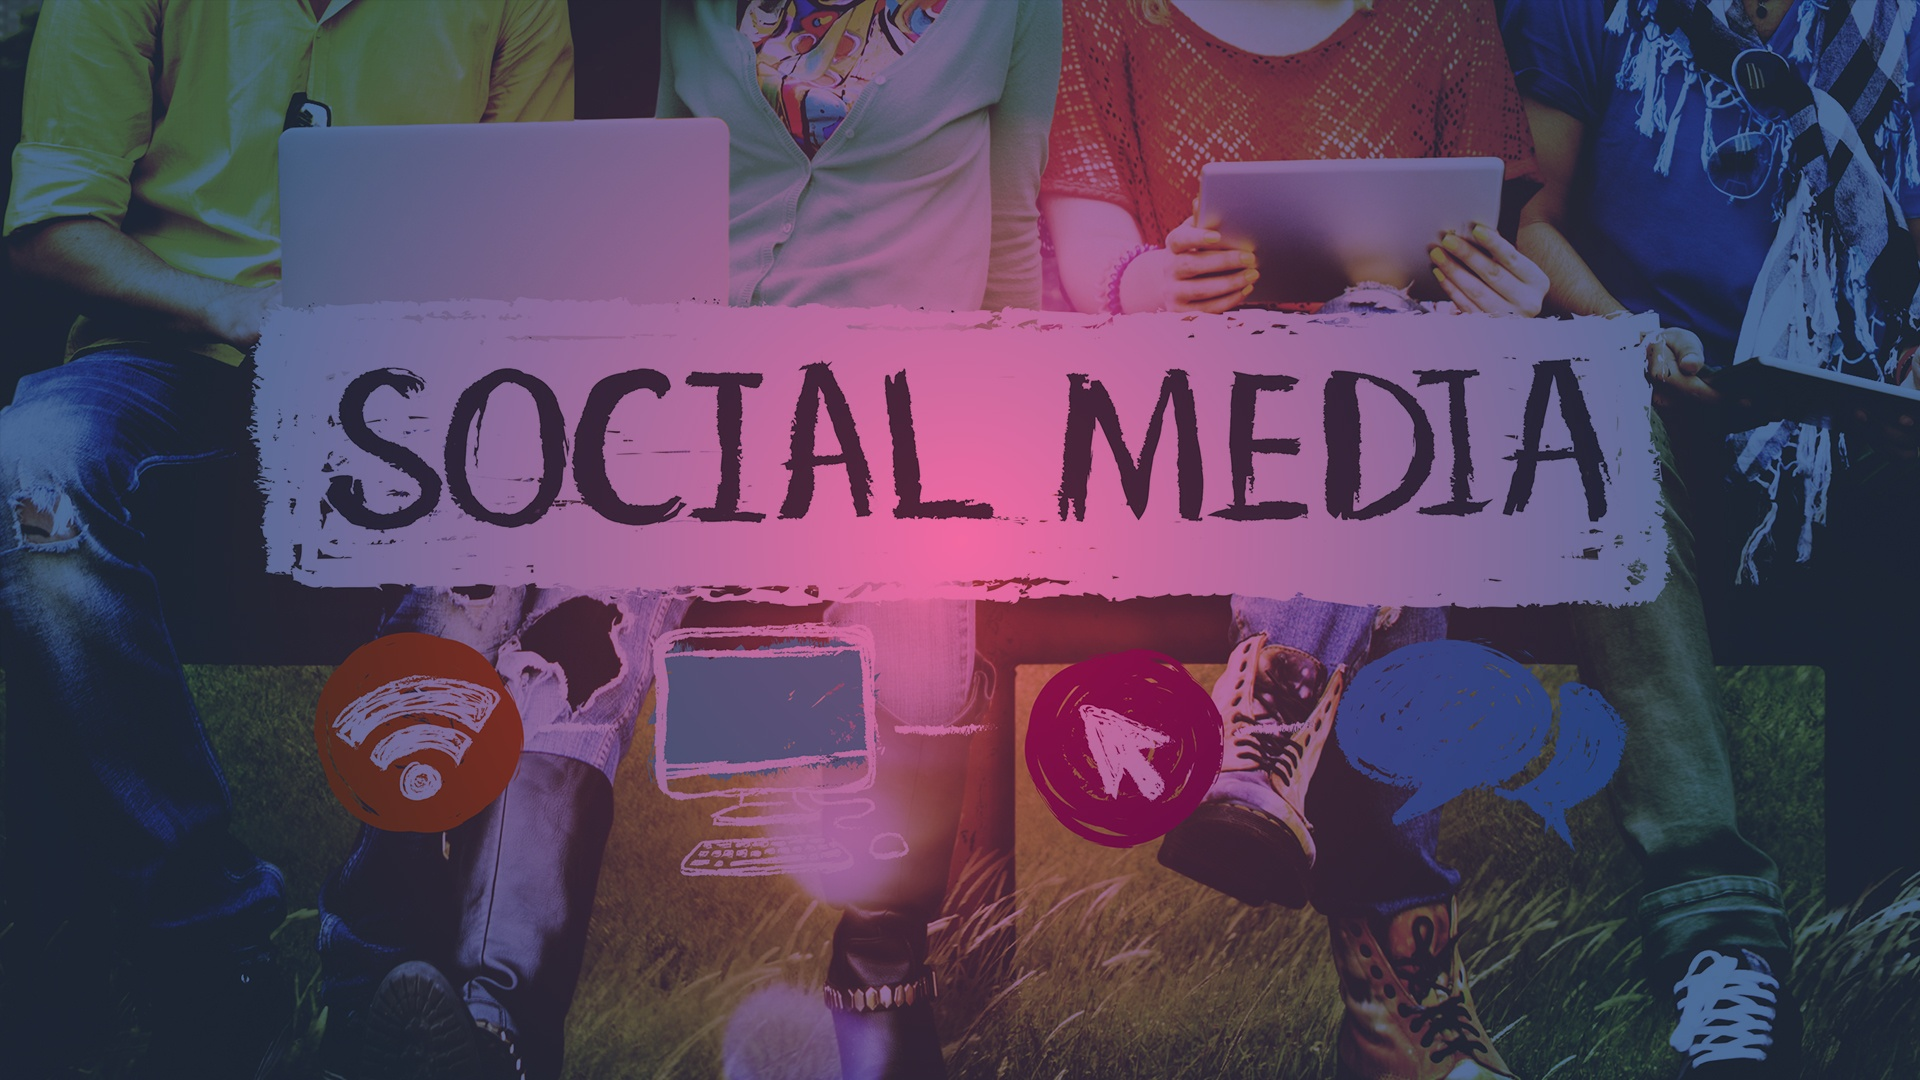 SocialMediaStrategy_1.jpg